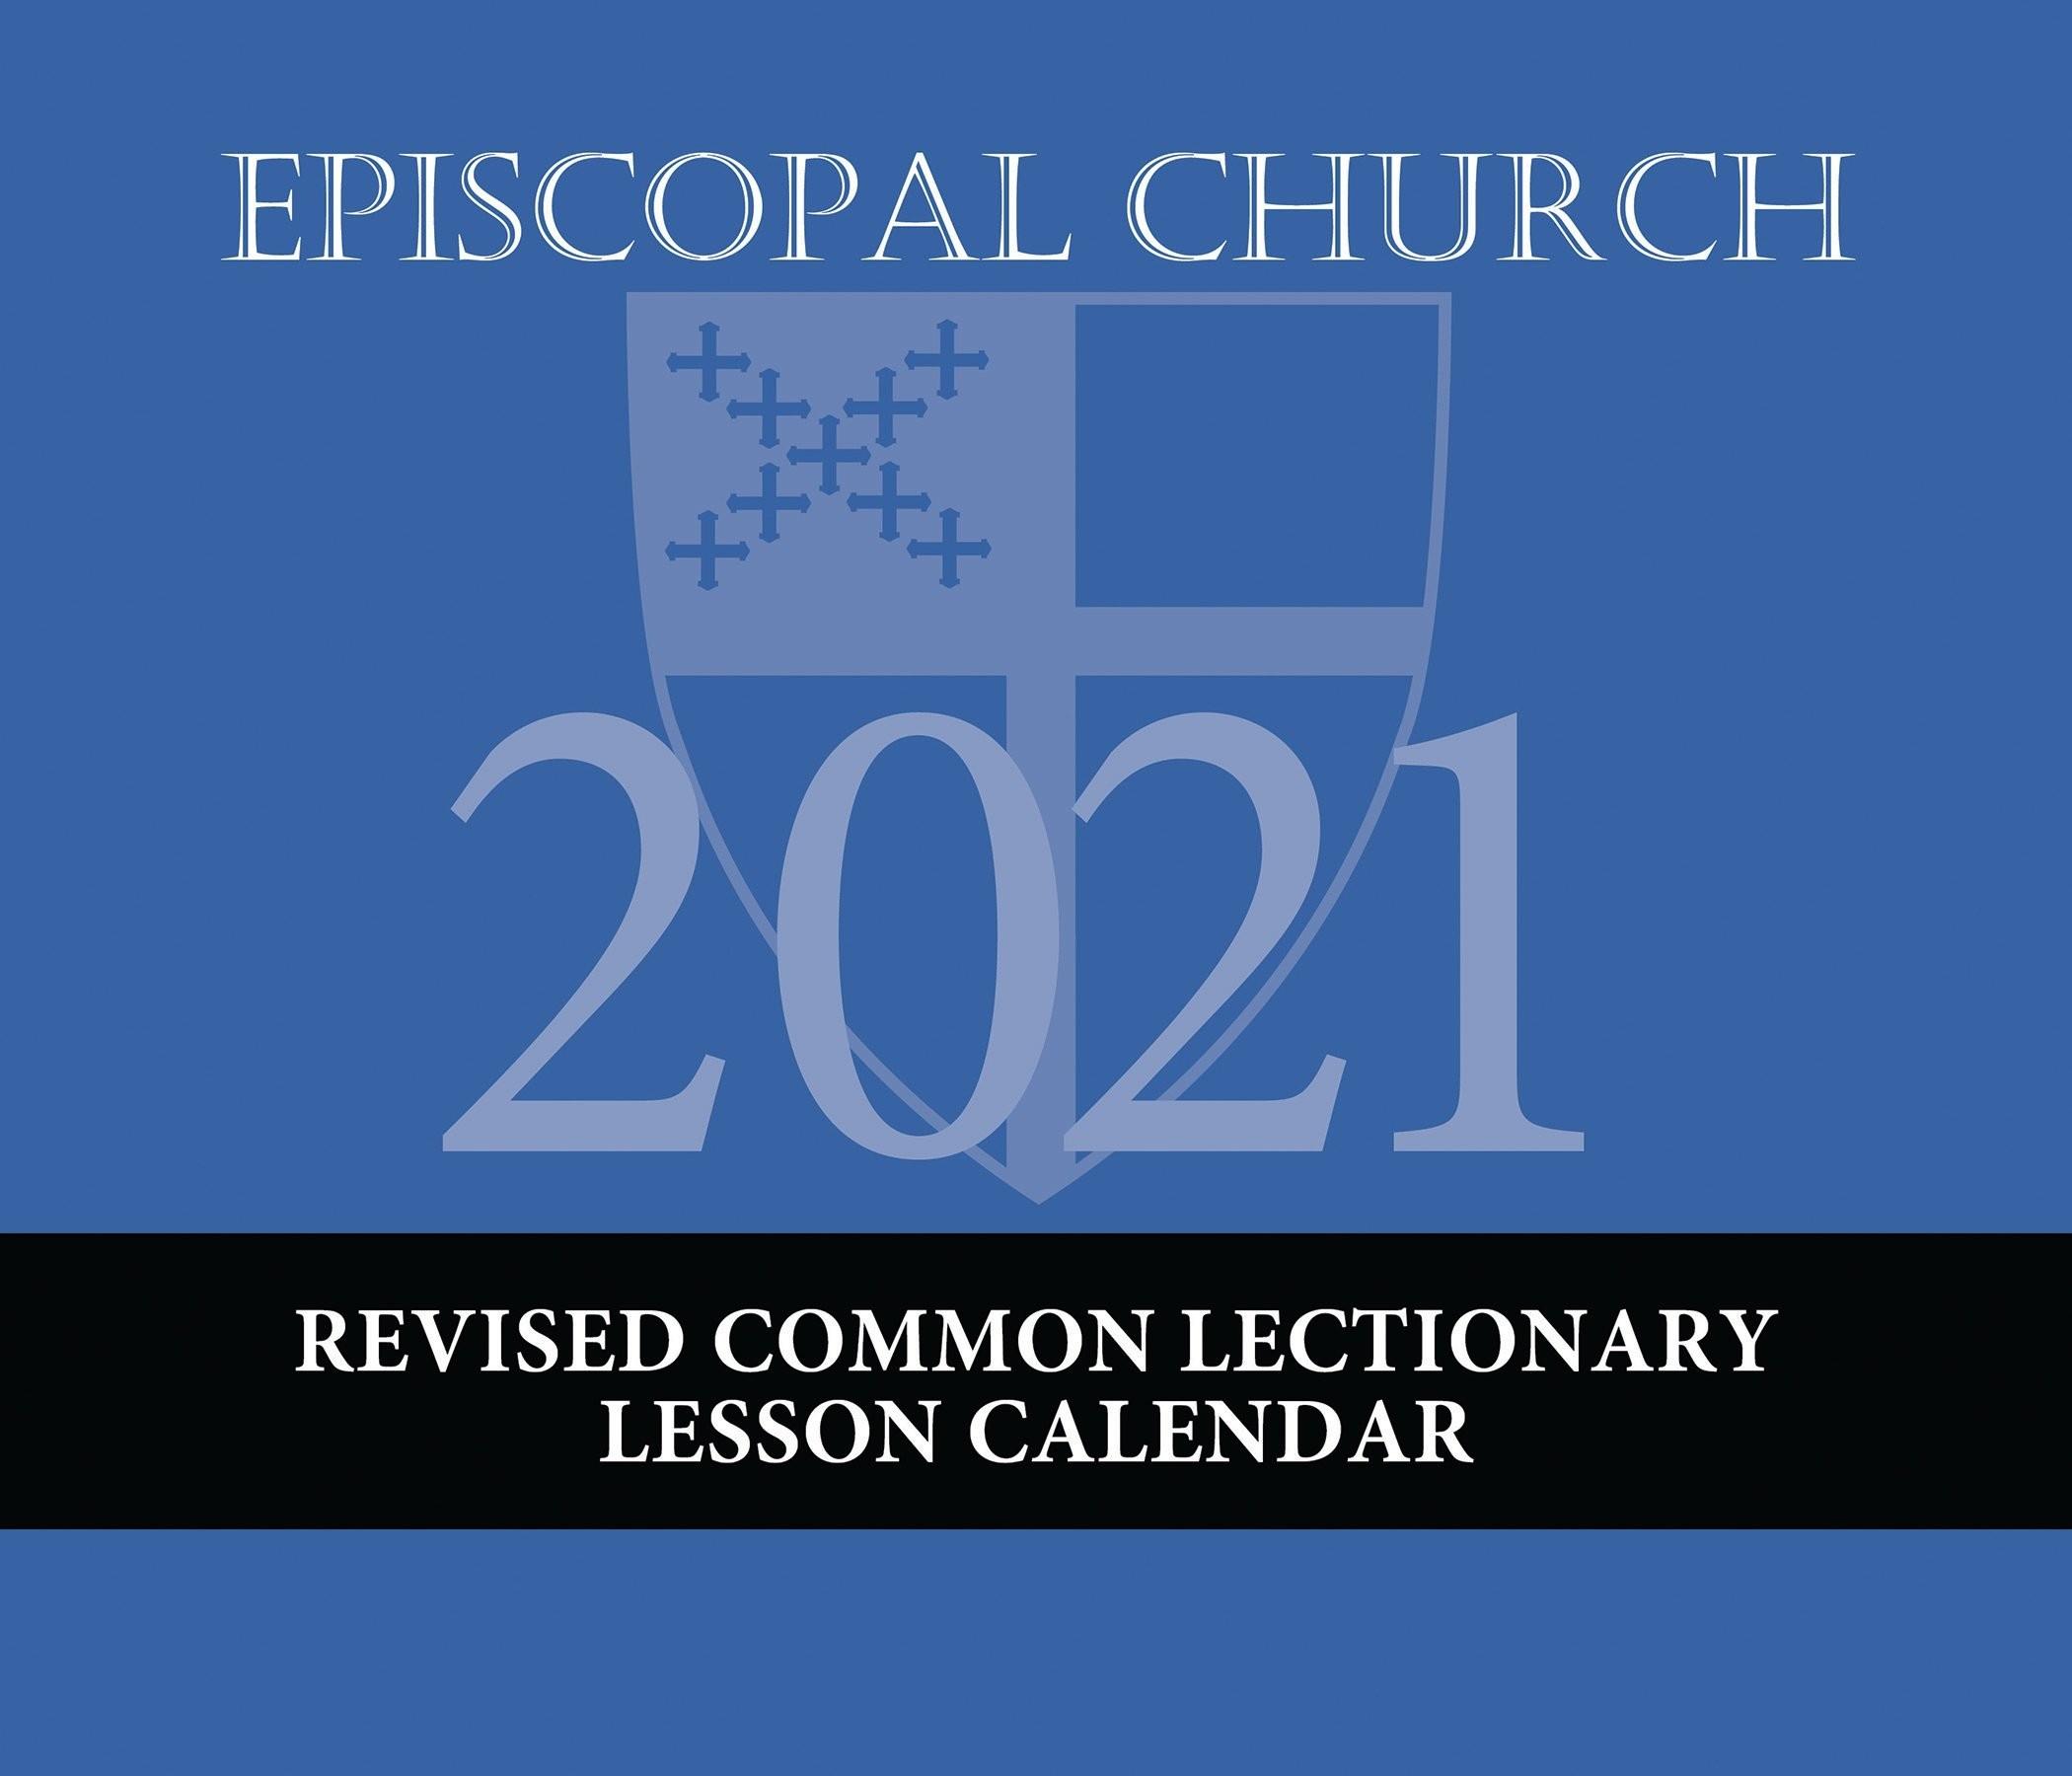 Episcopal Church Lesson Calendar Rcl 2021  Common Lectionary 2021